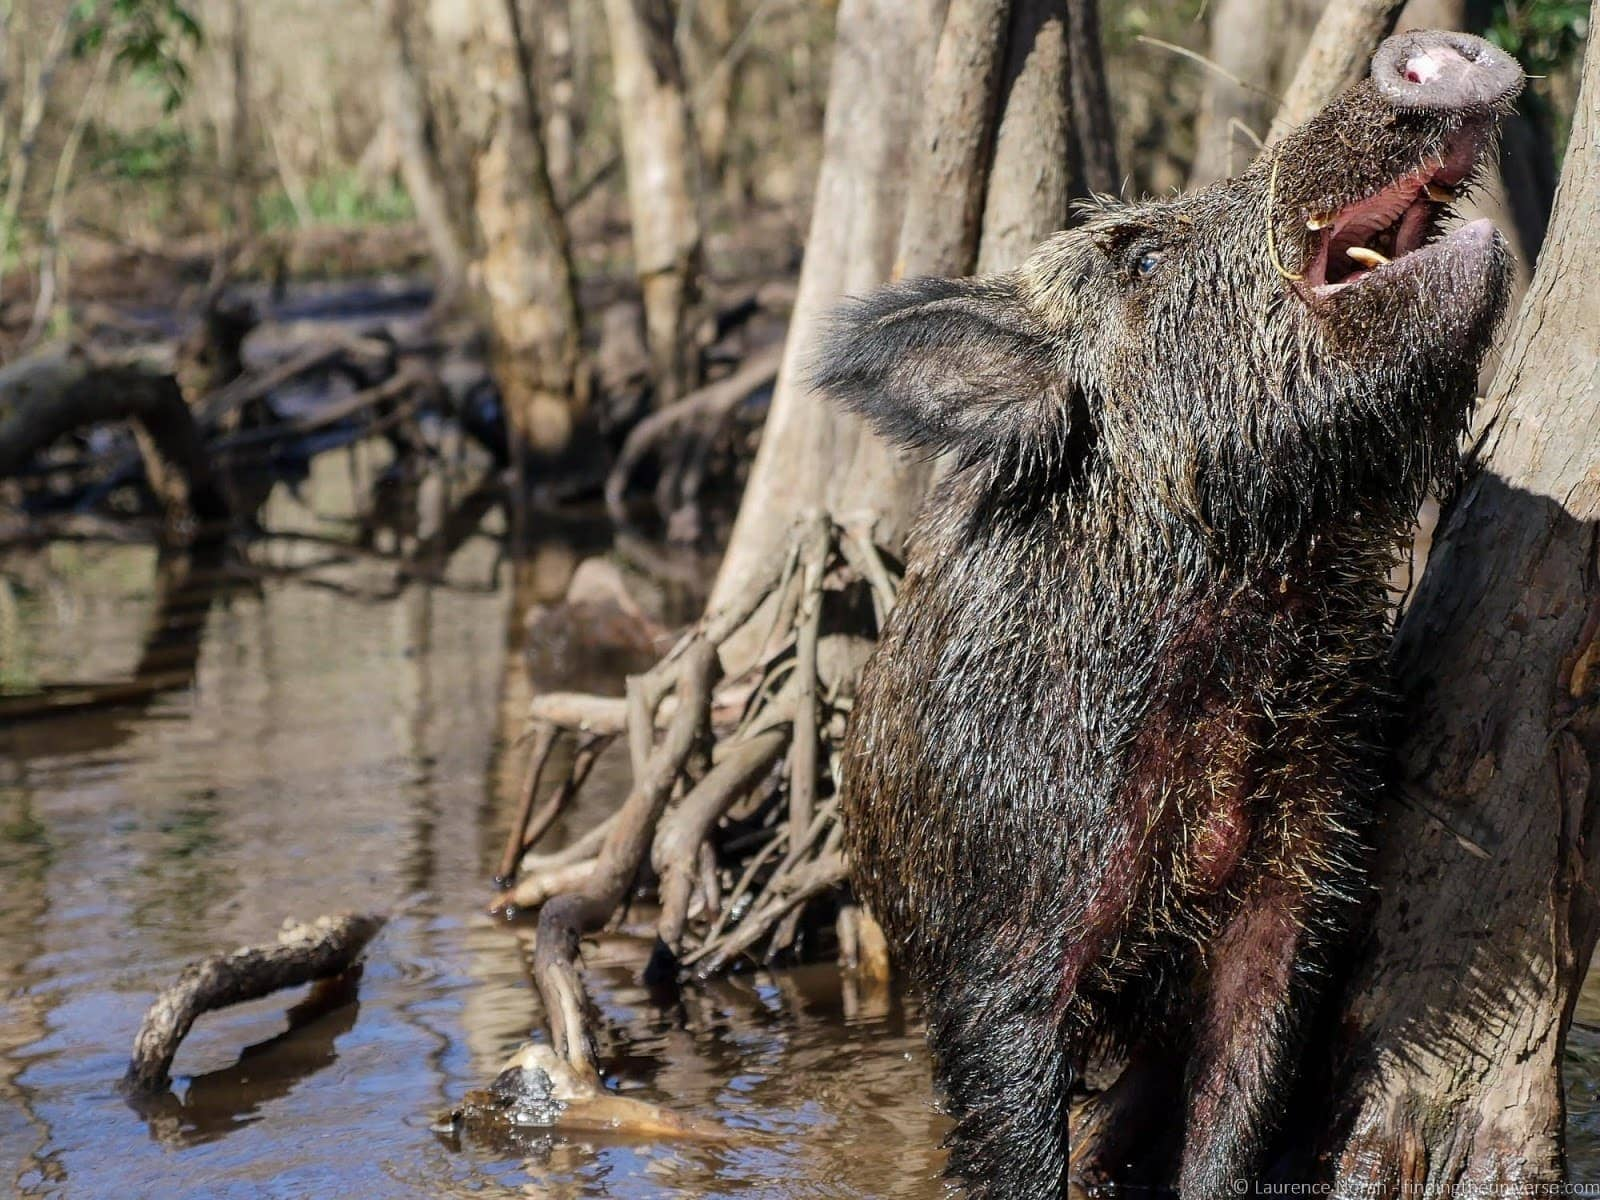 Cajun Enounters wild pig